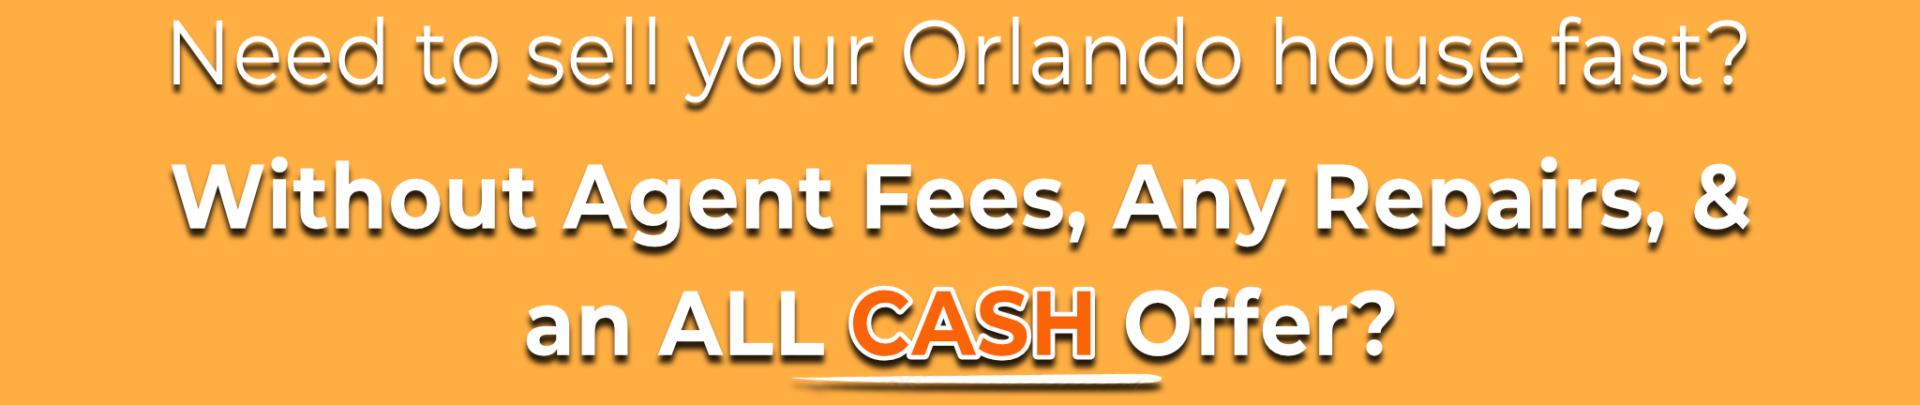 We Buy Houses Orlando   Sell My House Fast Orlando   Cash for Houses Orlando